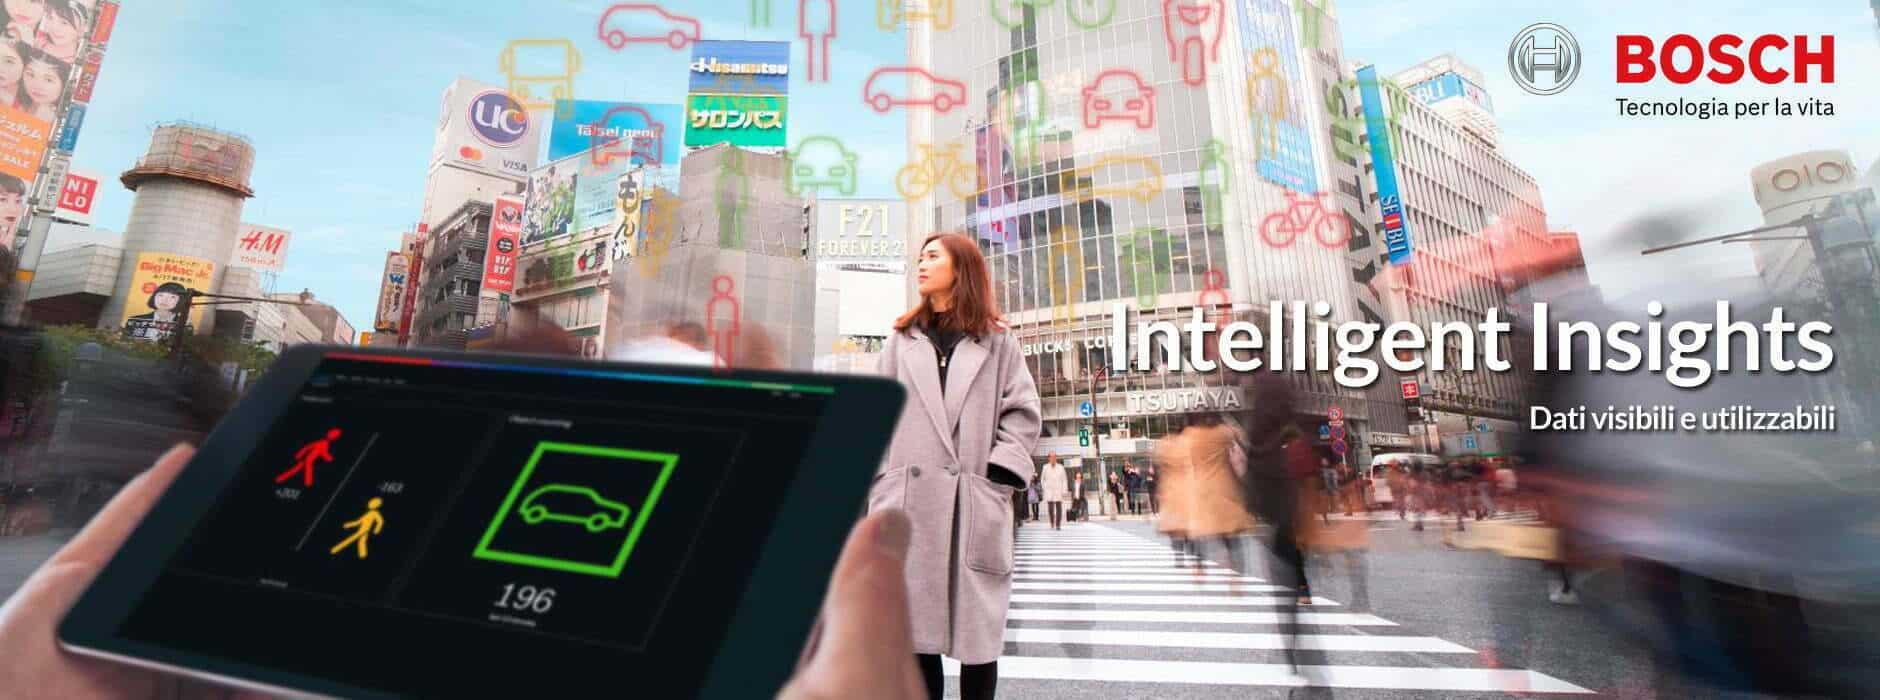 bosch_intelligent_insight